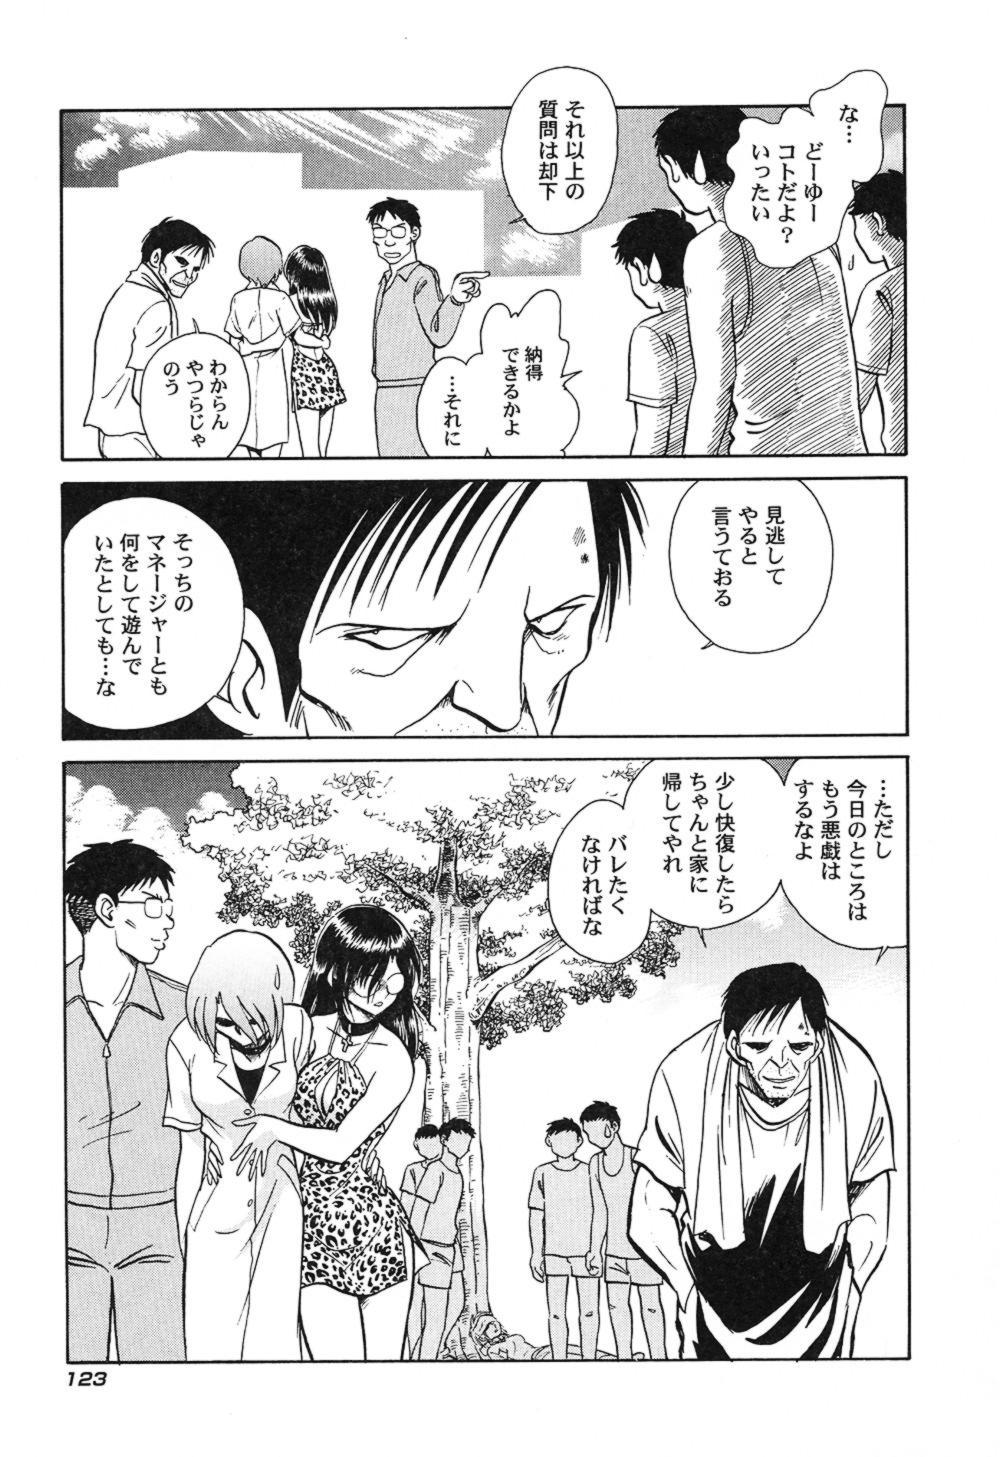 Hageshii Kagai Jugyou 125